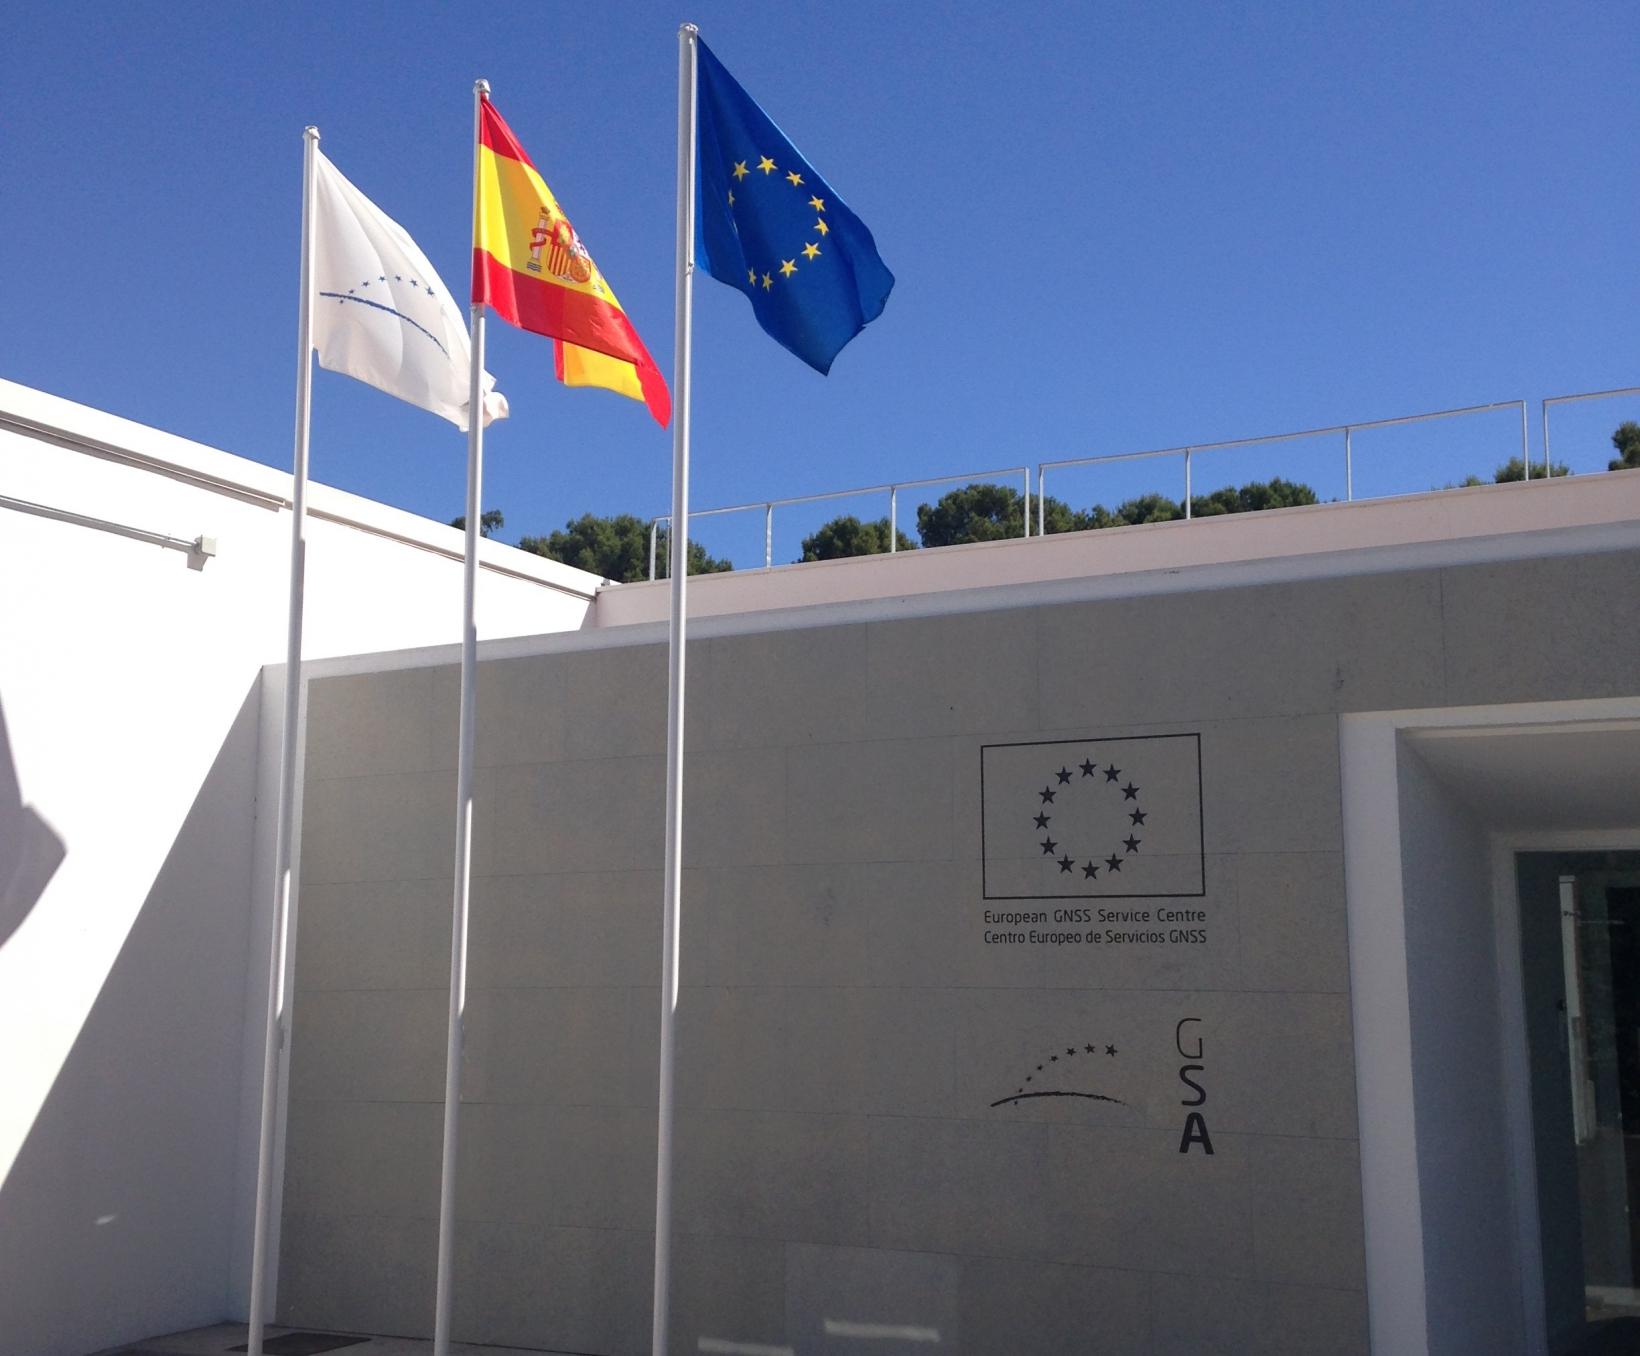 GSC premises in Madrid